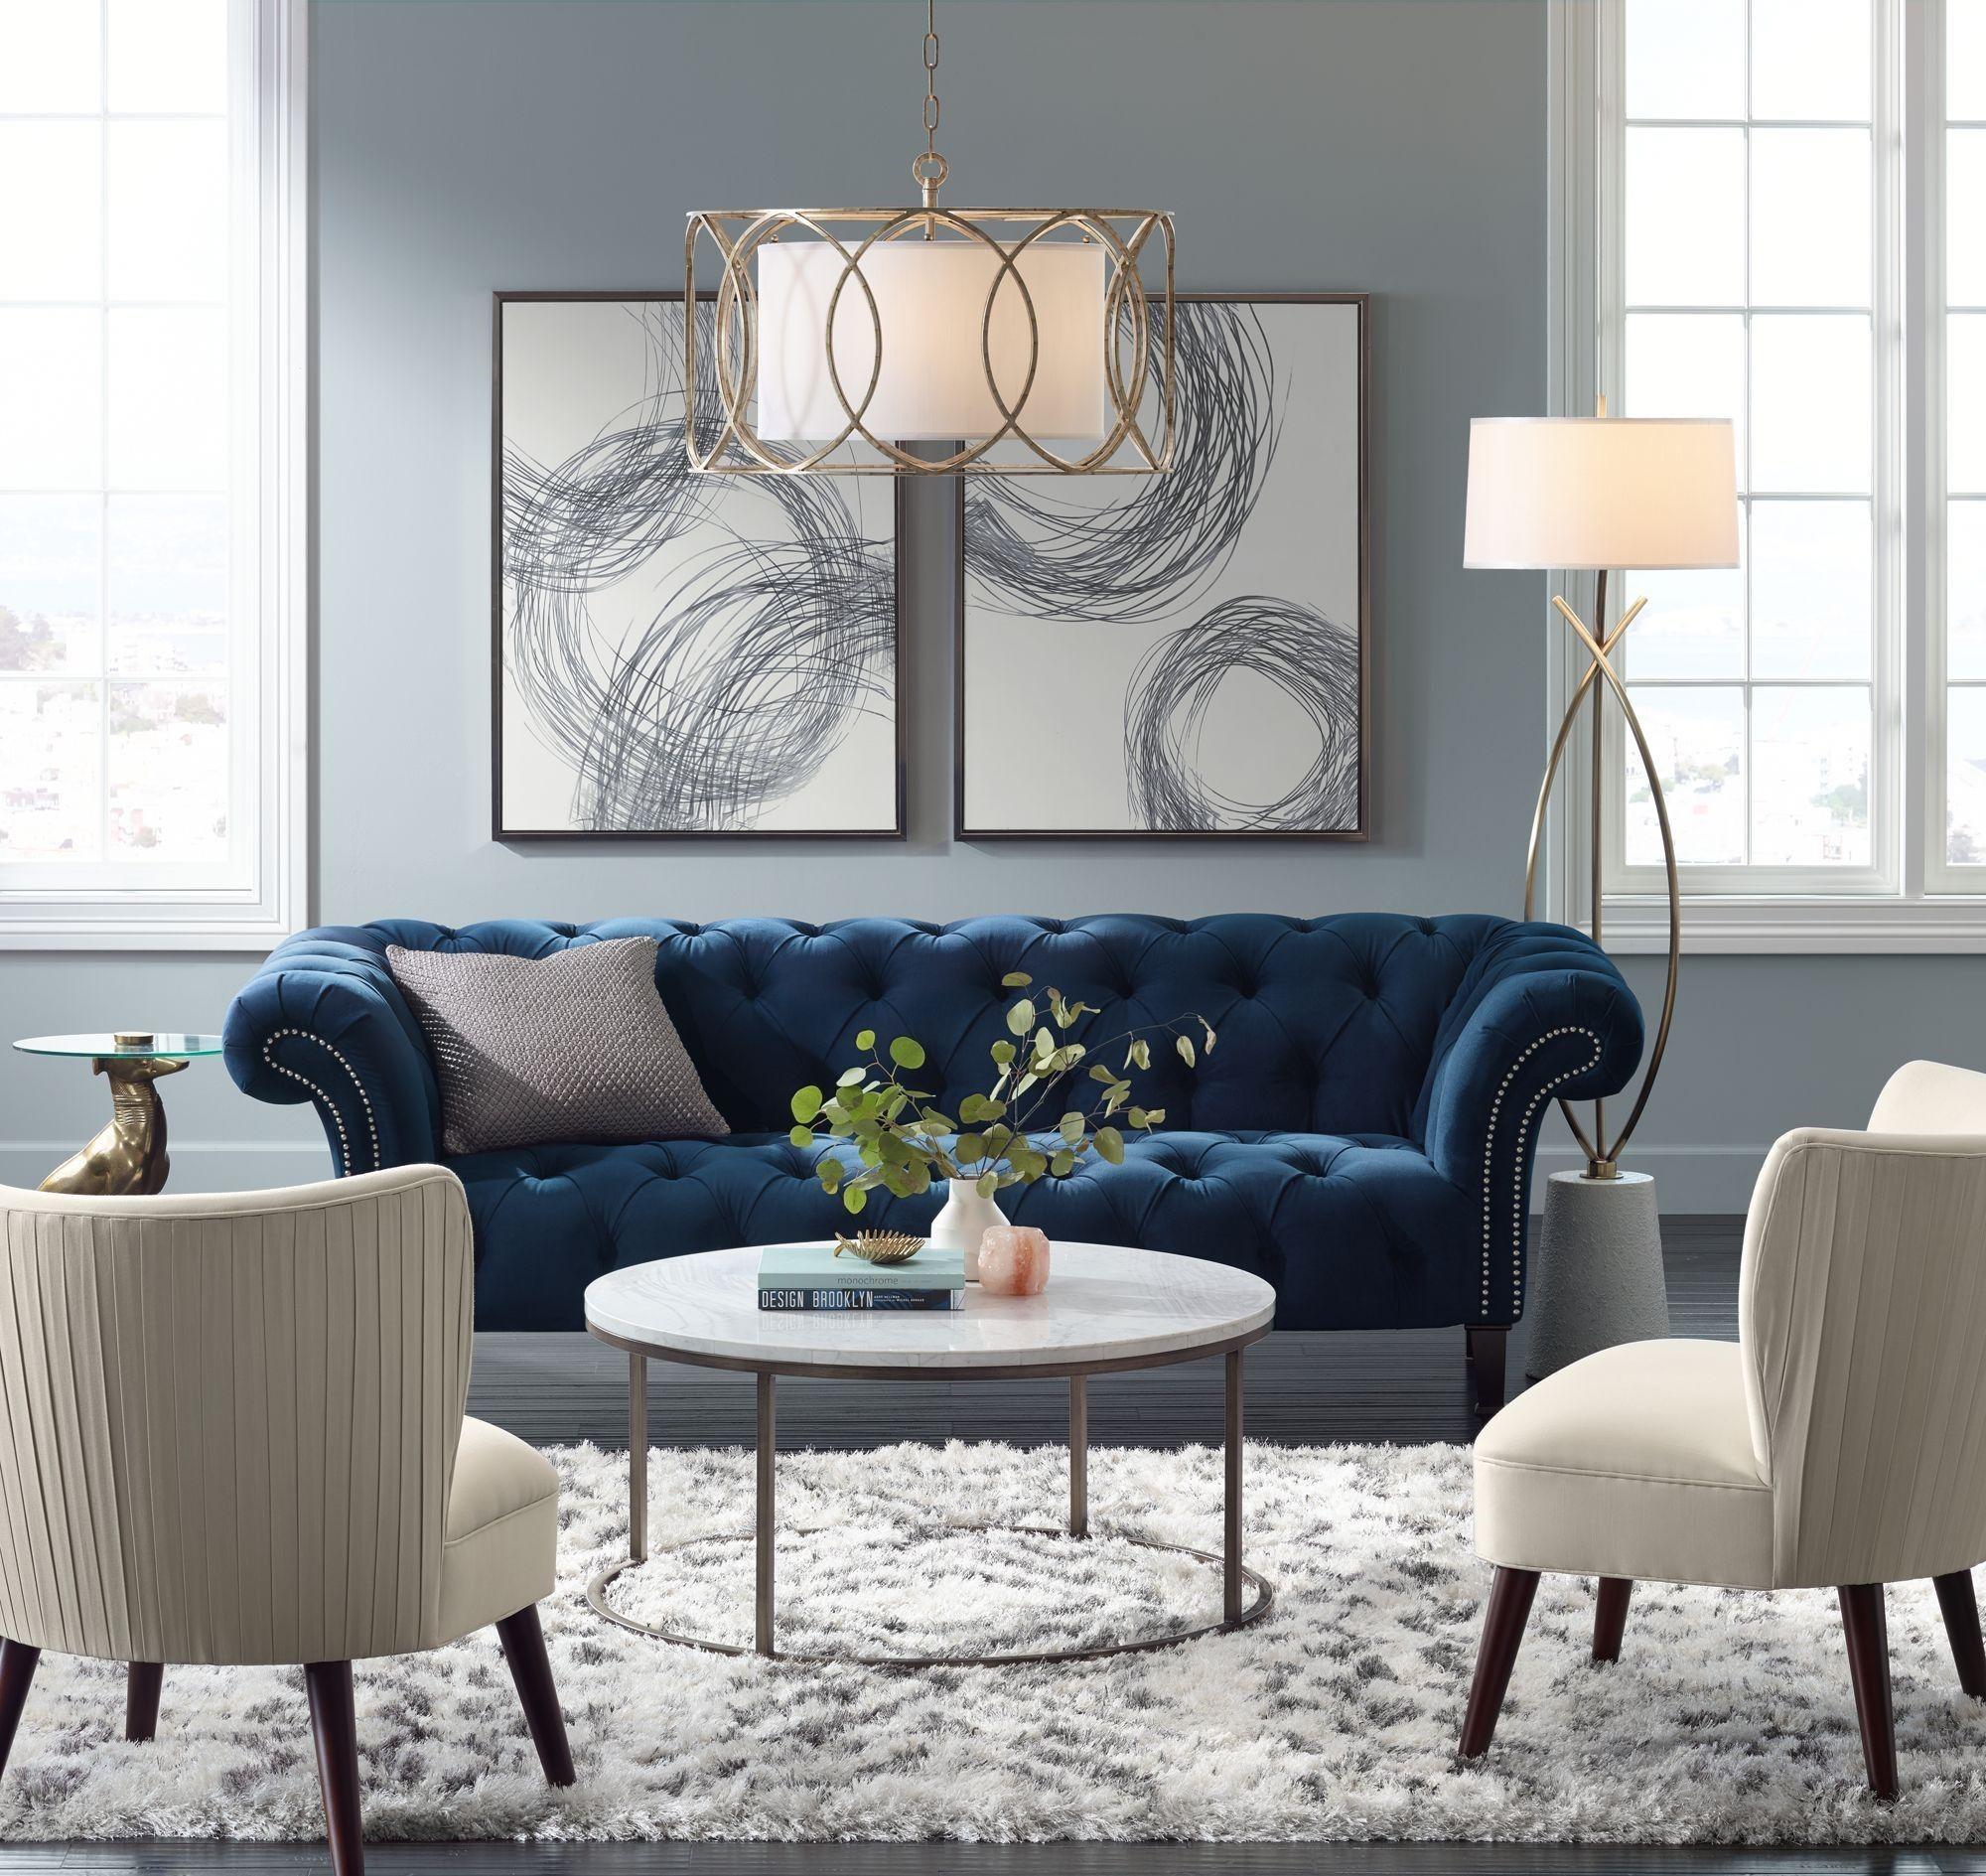 So Creative Living Room Ideas Homeideas Livingroom Livingspace Blue Sofas Living Room Blue Couch Living Room Living Room Decor Apartment